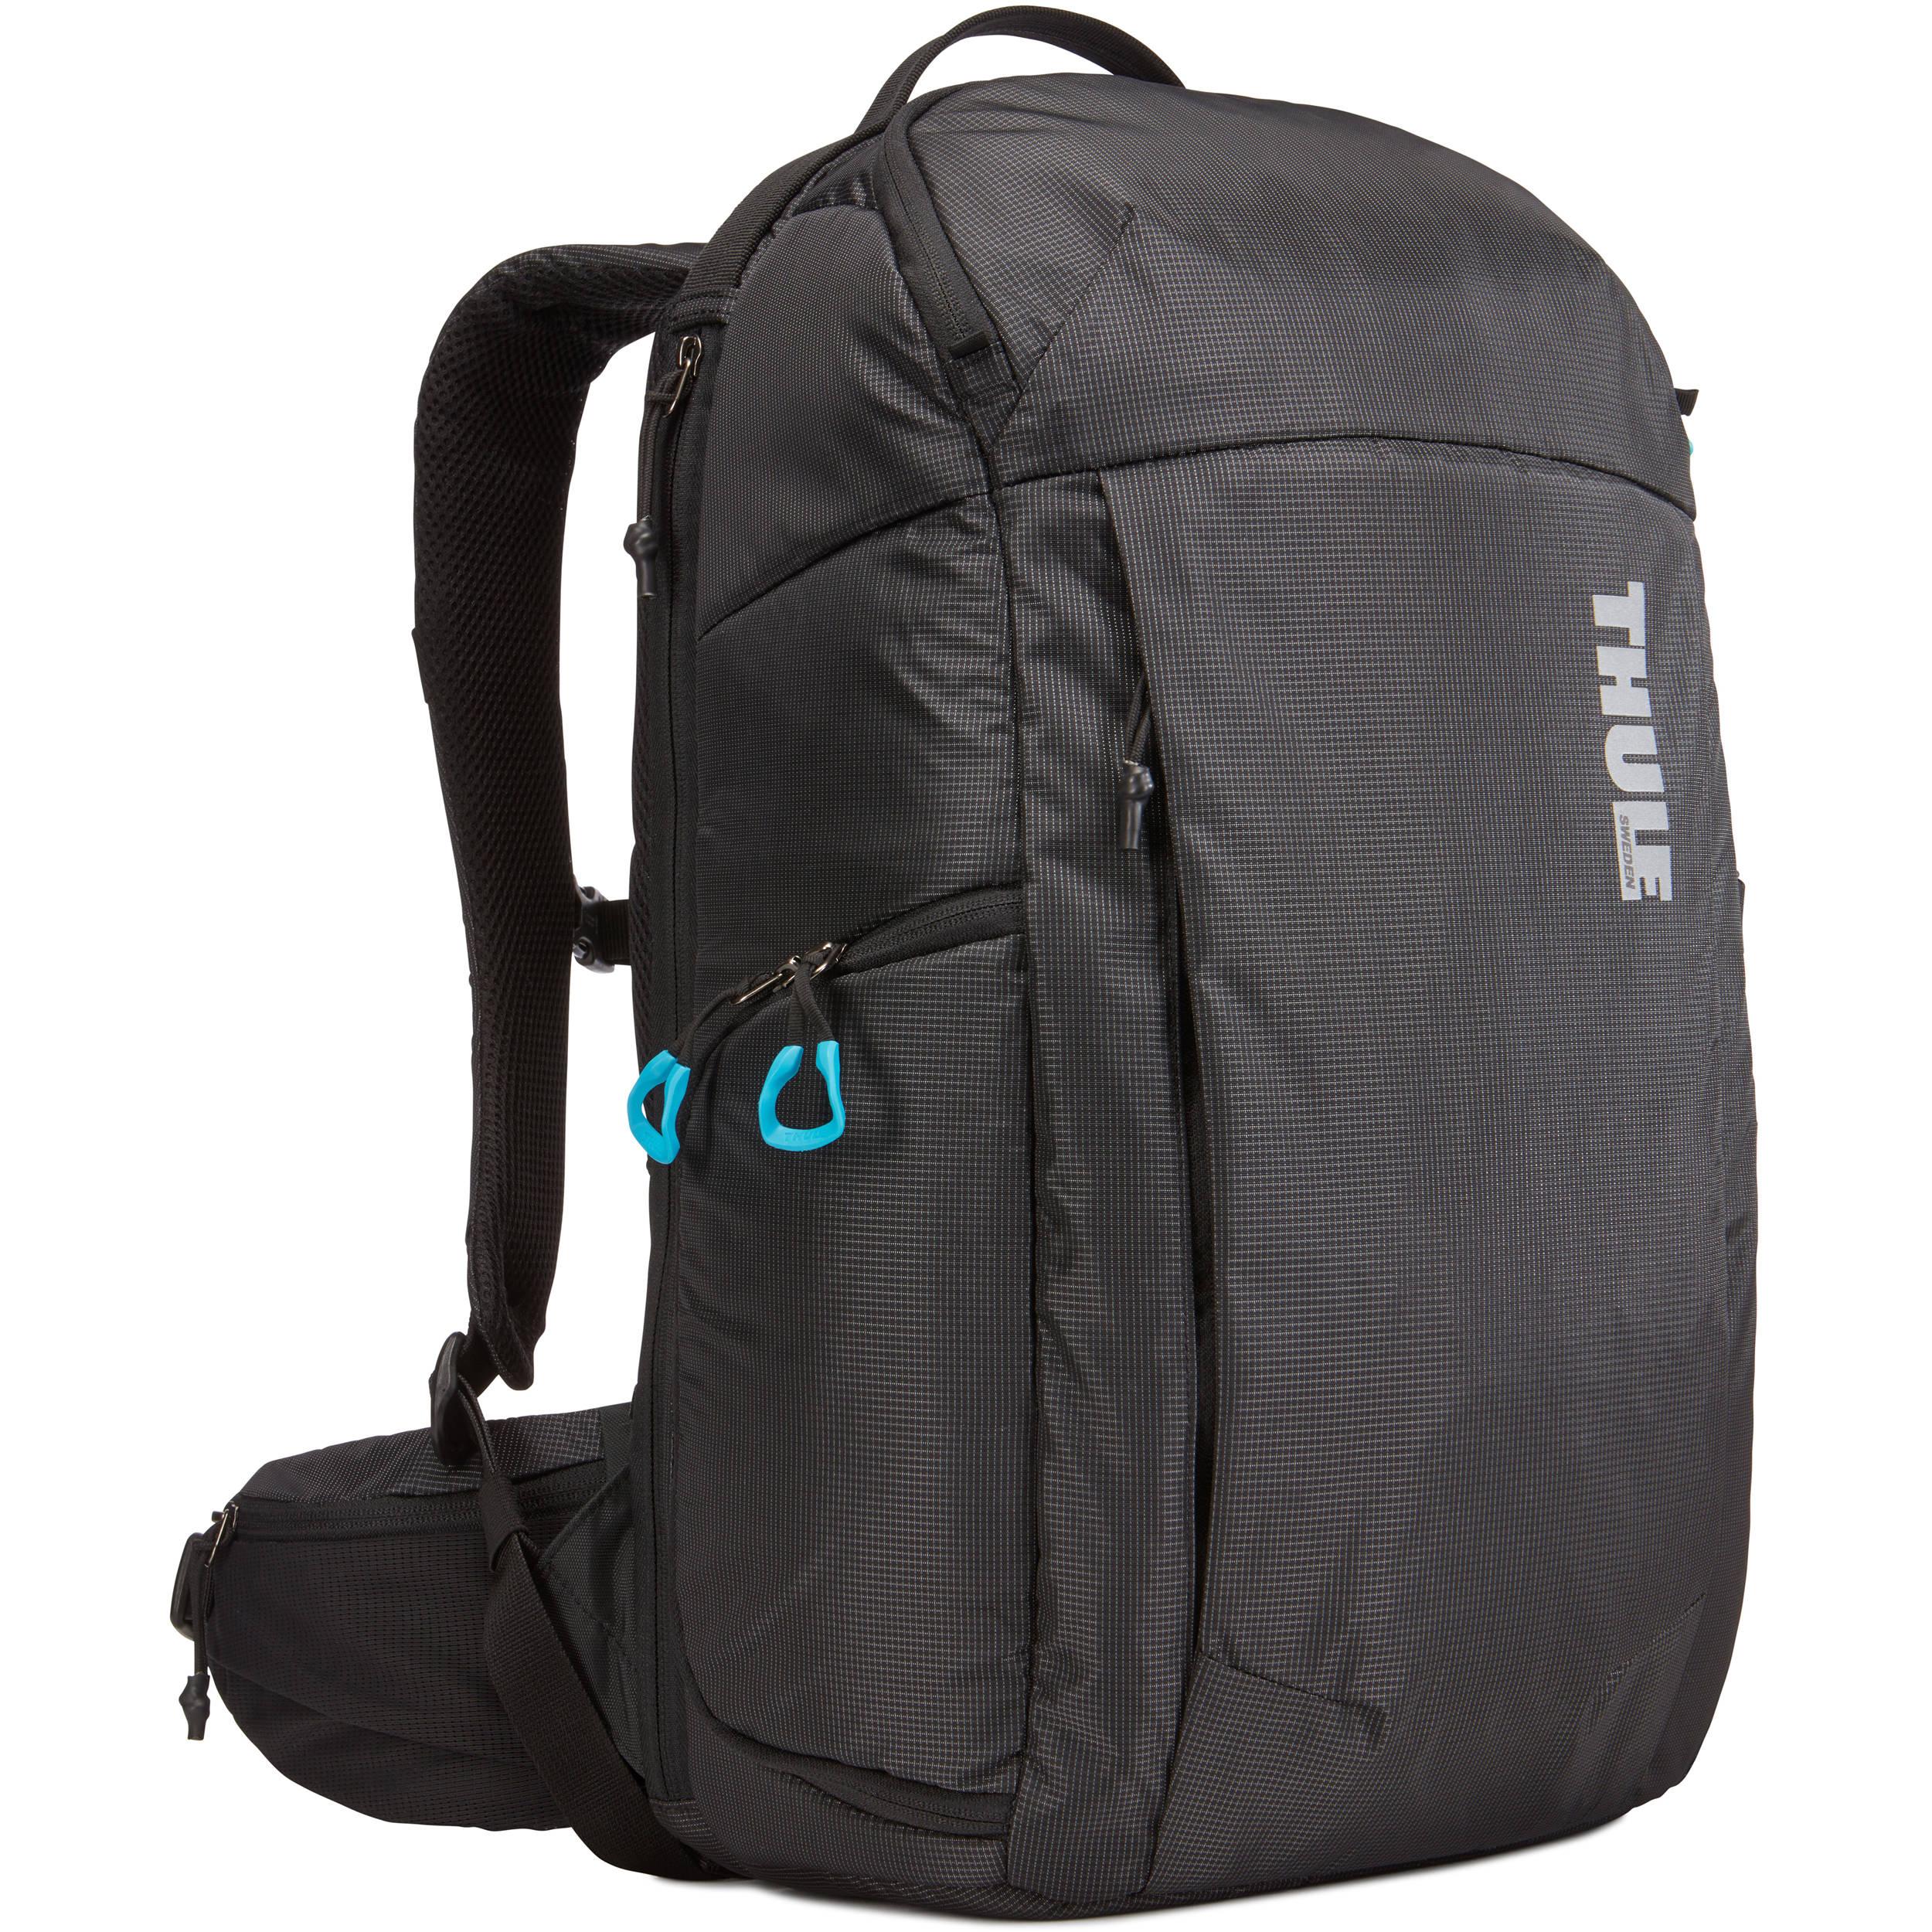 Thule Aspect Dslr Backpack Black 3203410 B H Photo Video